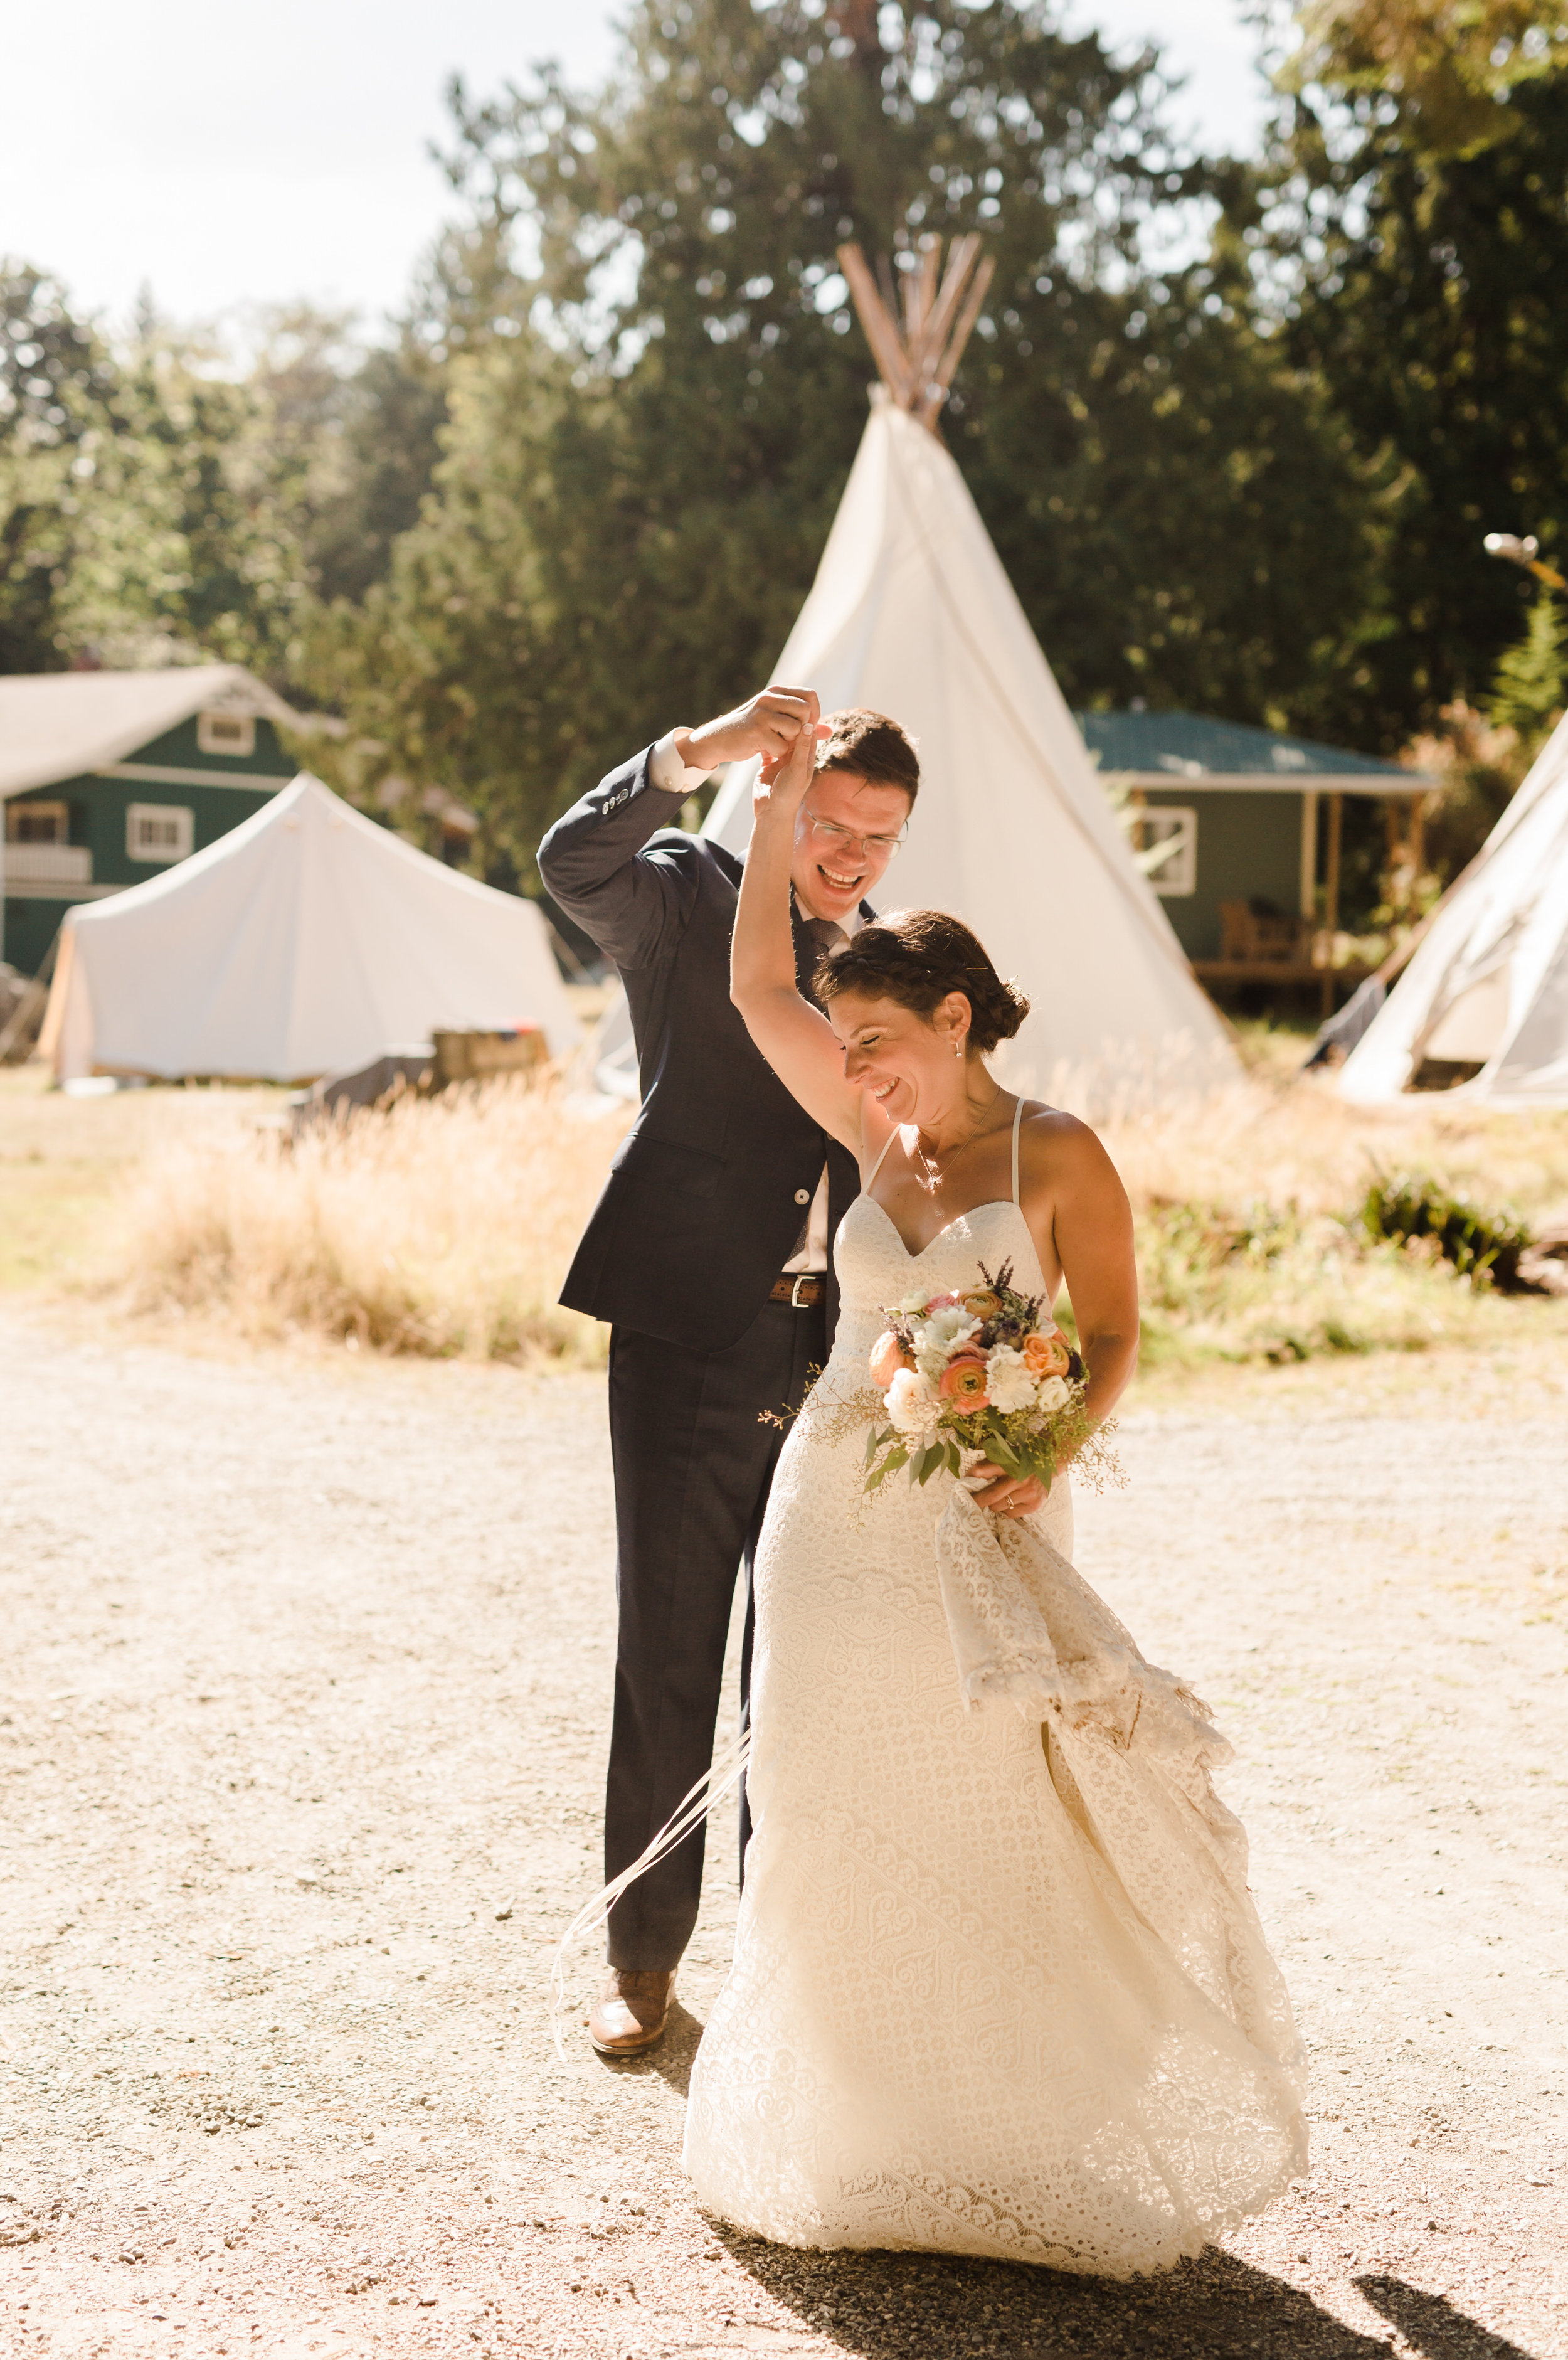 Camp Fircom Wedding - Vancouver Wedding Photographer & Videographer - Sunshine Coast Wedding Photos - Sunshine Coast Wedding Photographer - Jennifer Picard Photography - IMG_2160.jpg